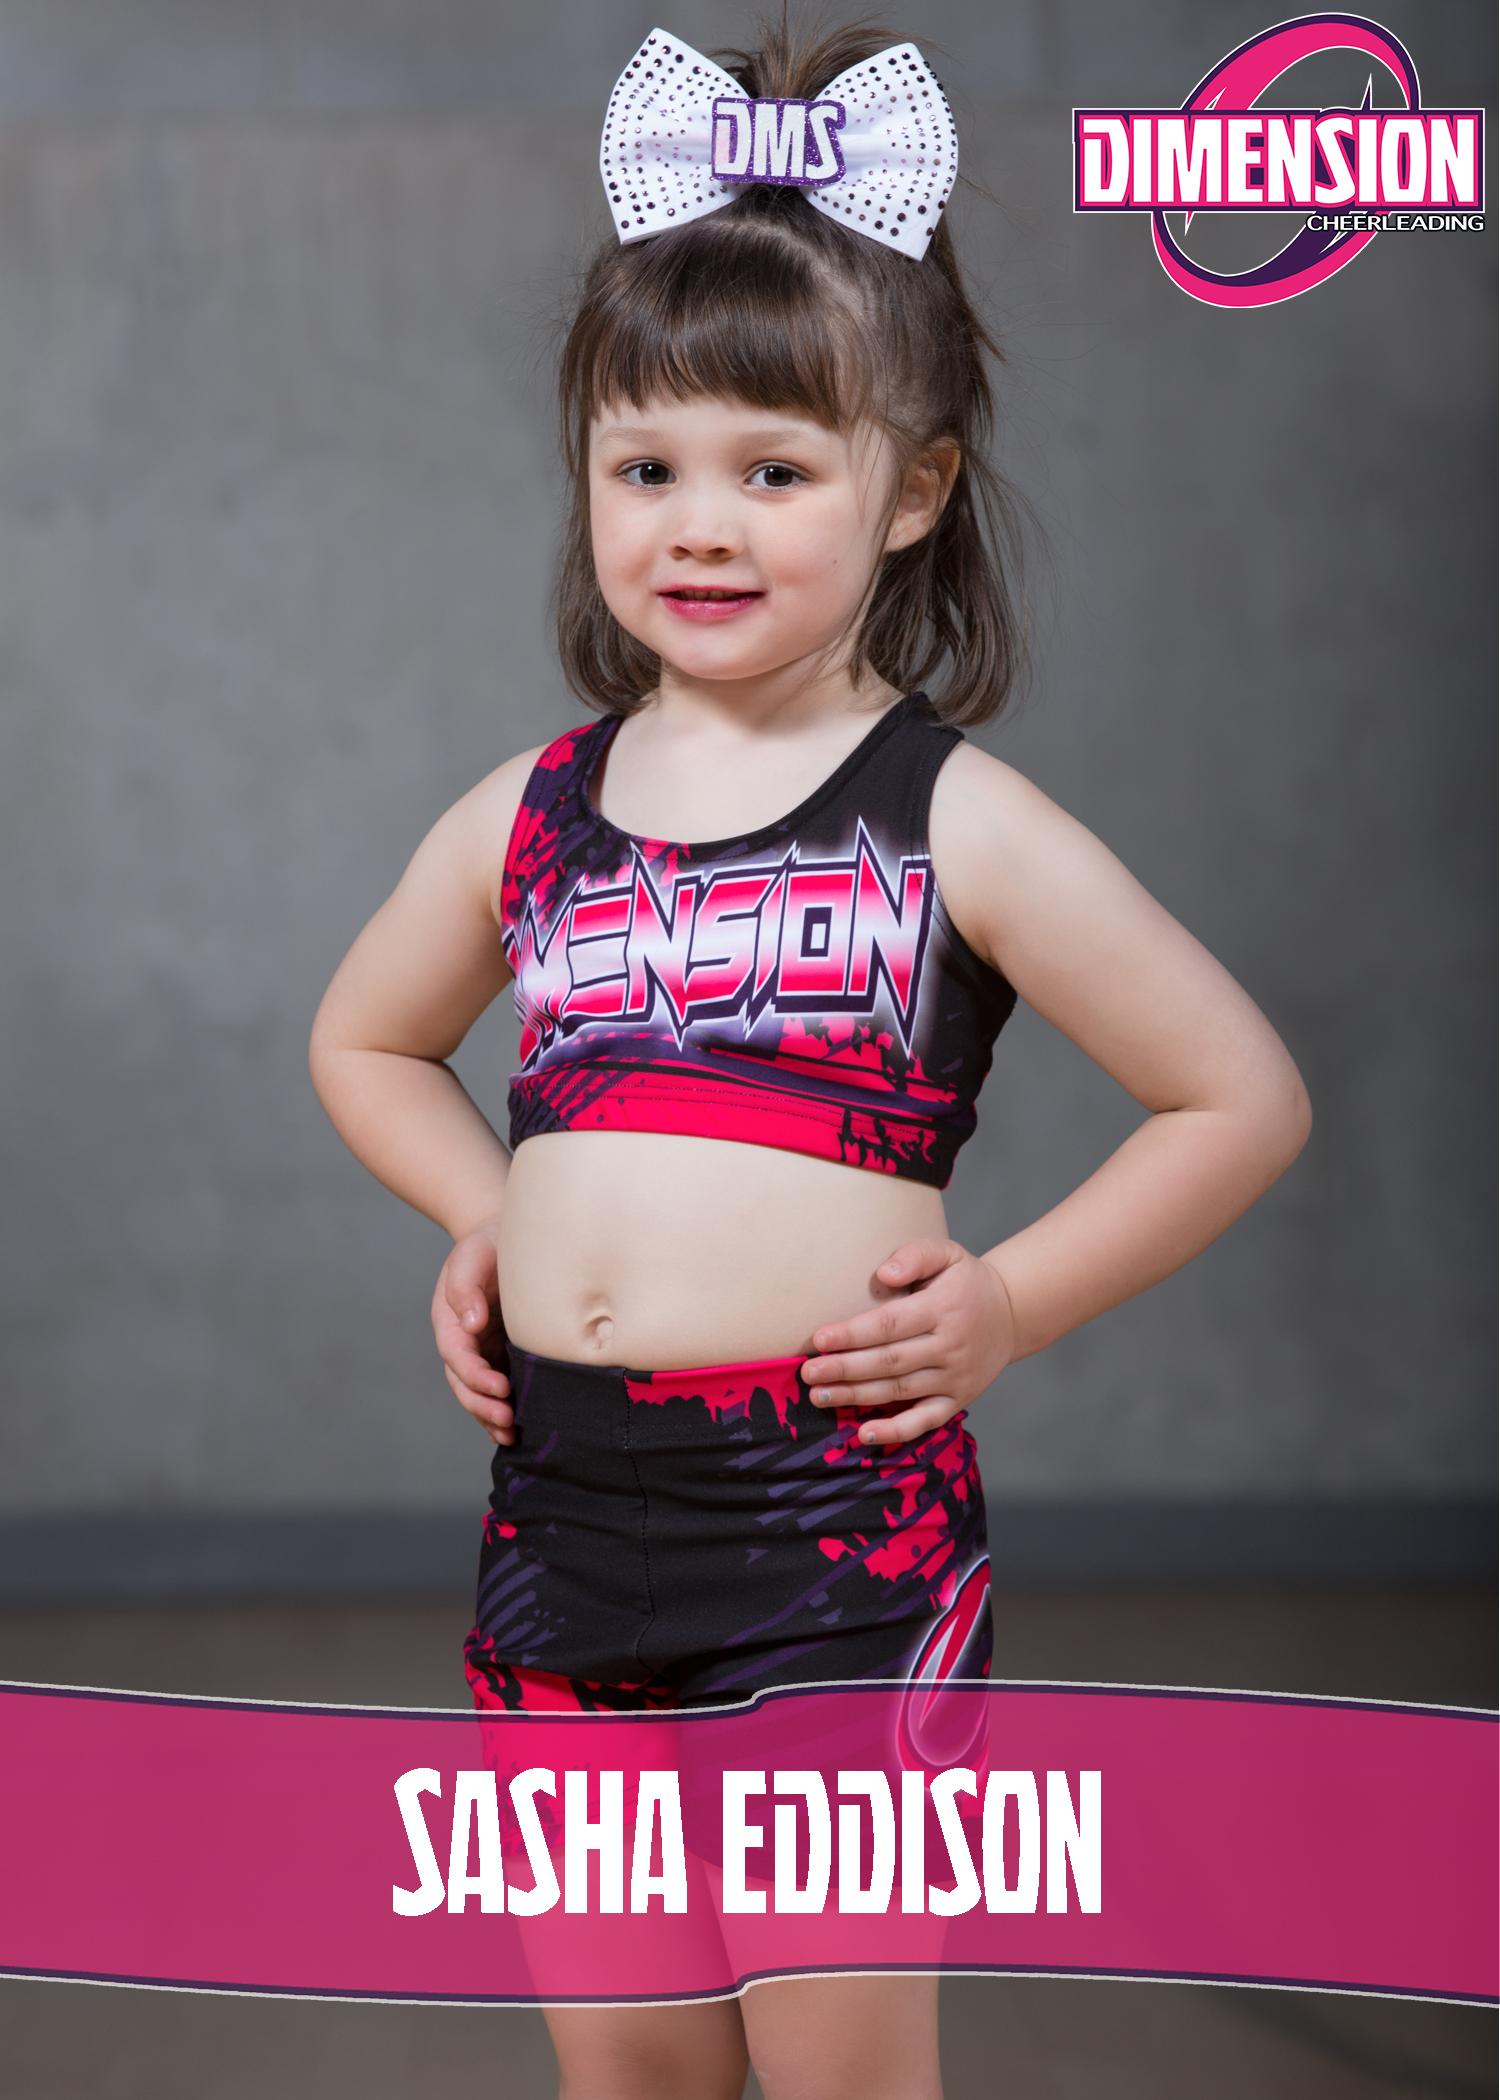 Sasha Eddison